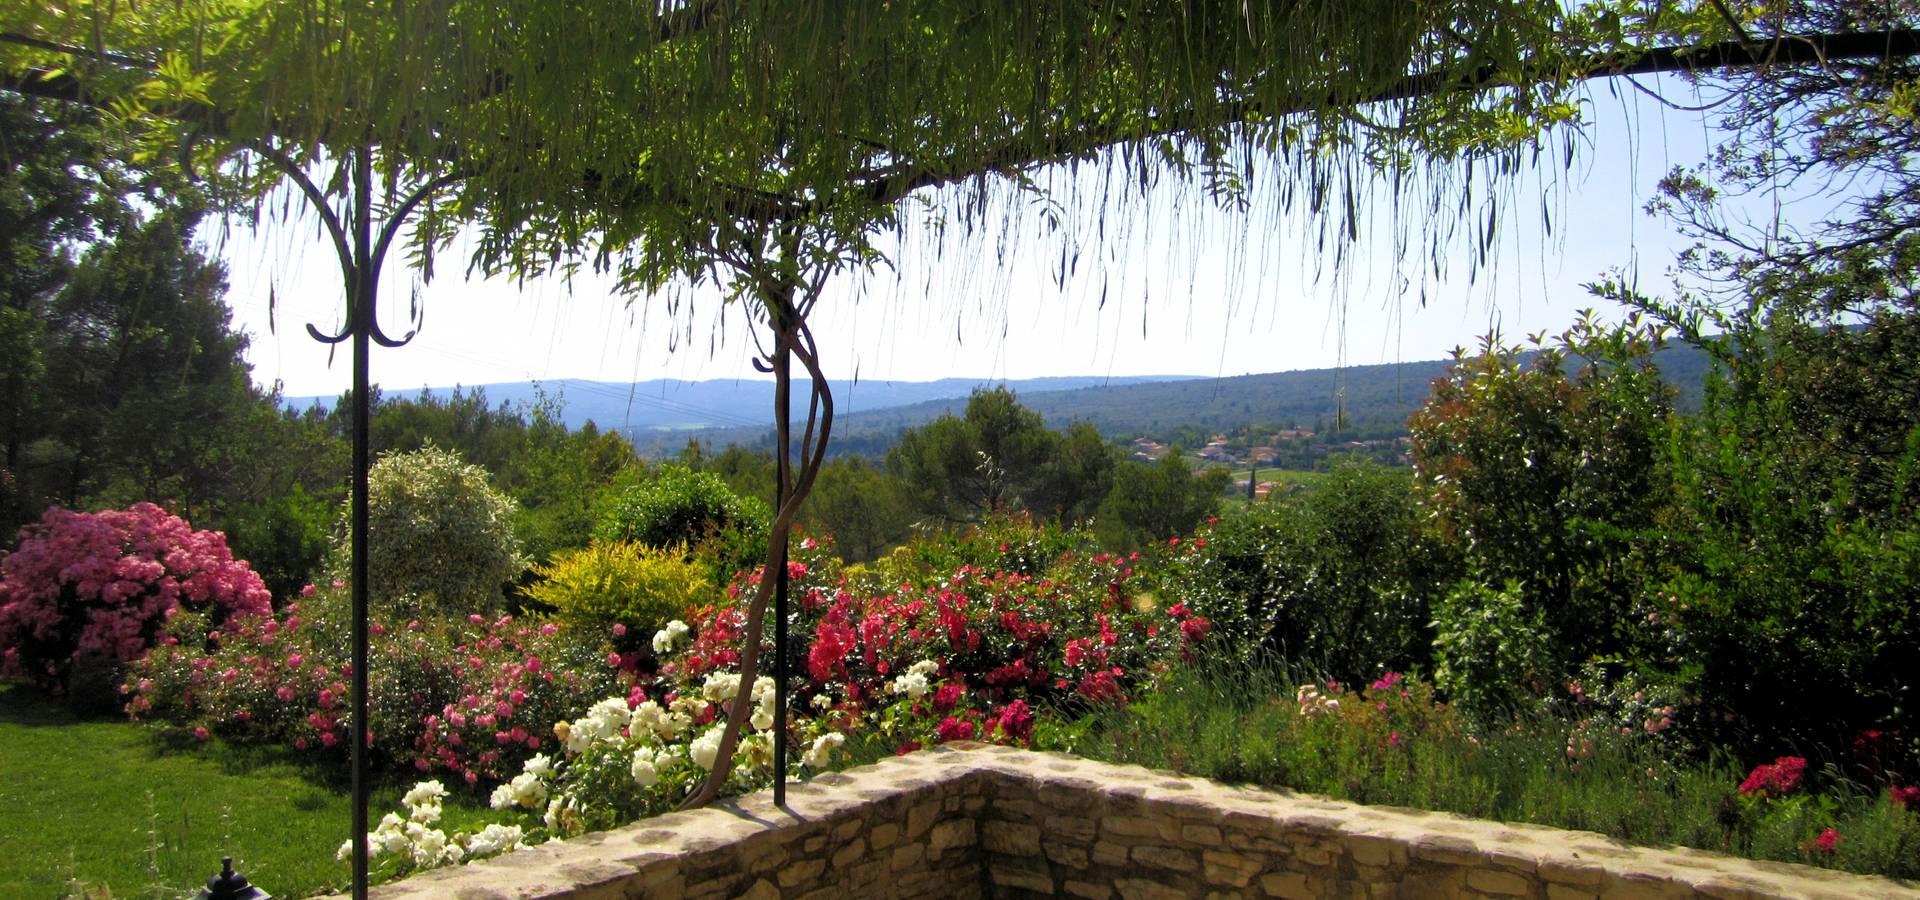 I.D.O jardins